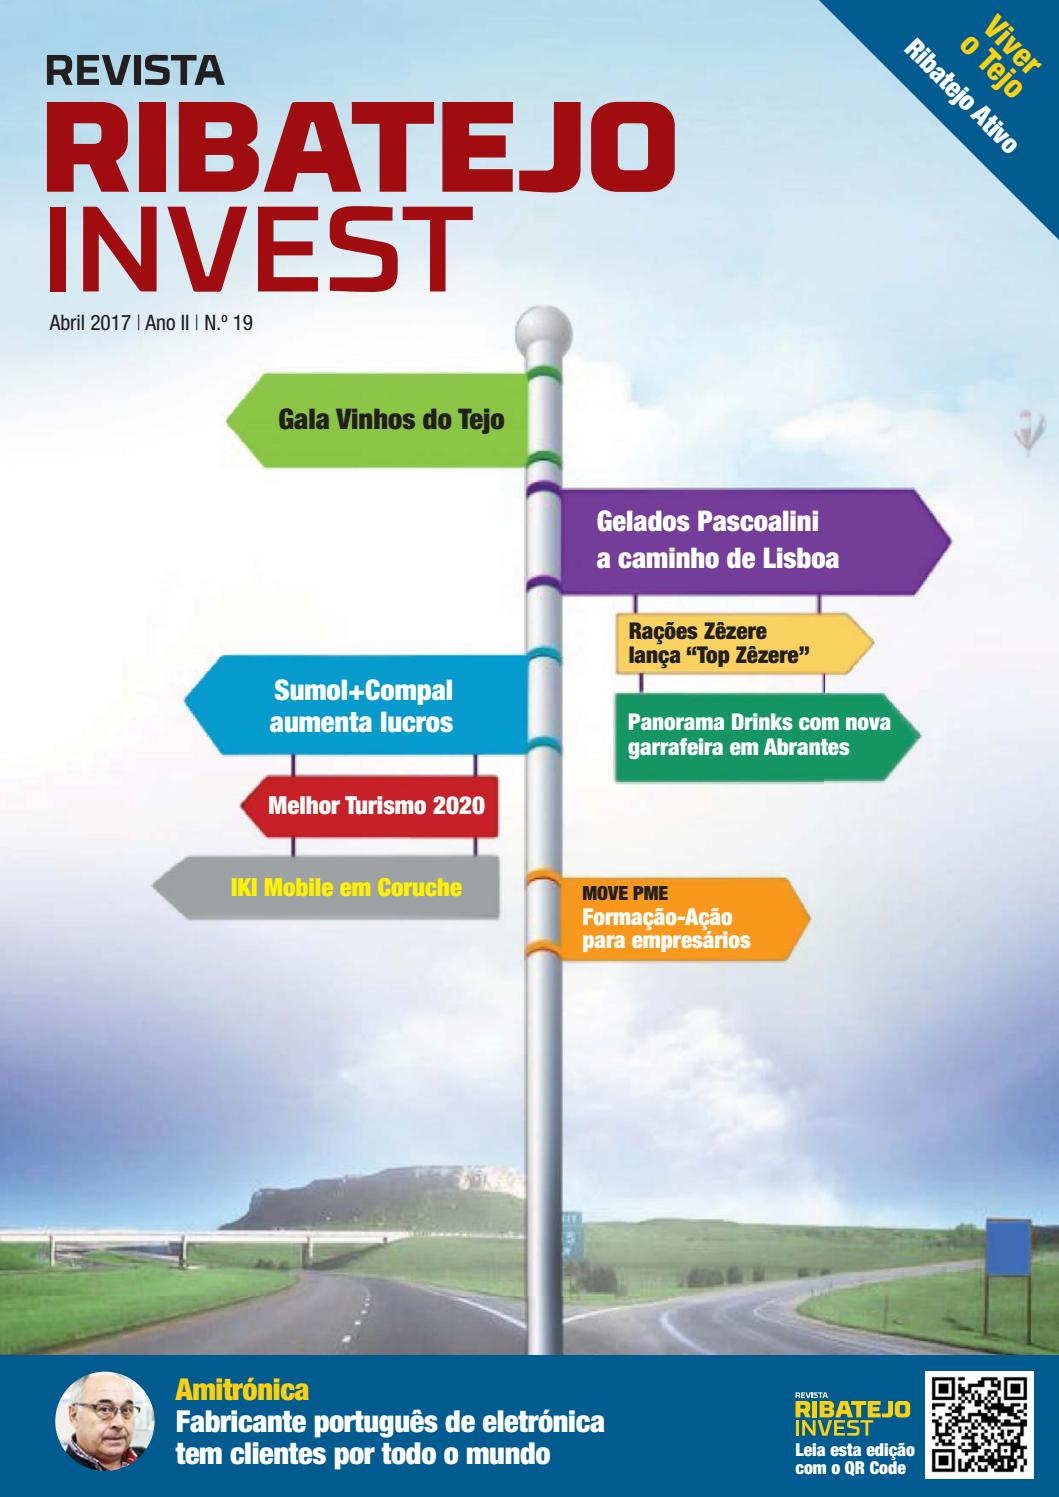 Revista Ribatejo Invest   abril 2017 by NERSANT Associação Empresarial -  issuu f10c01747ae38